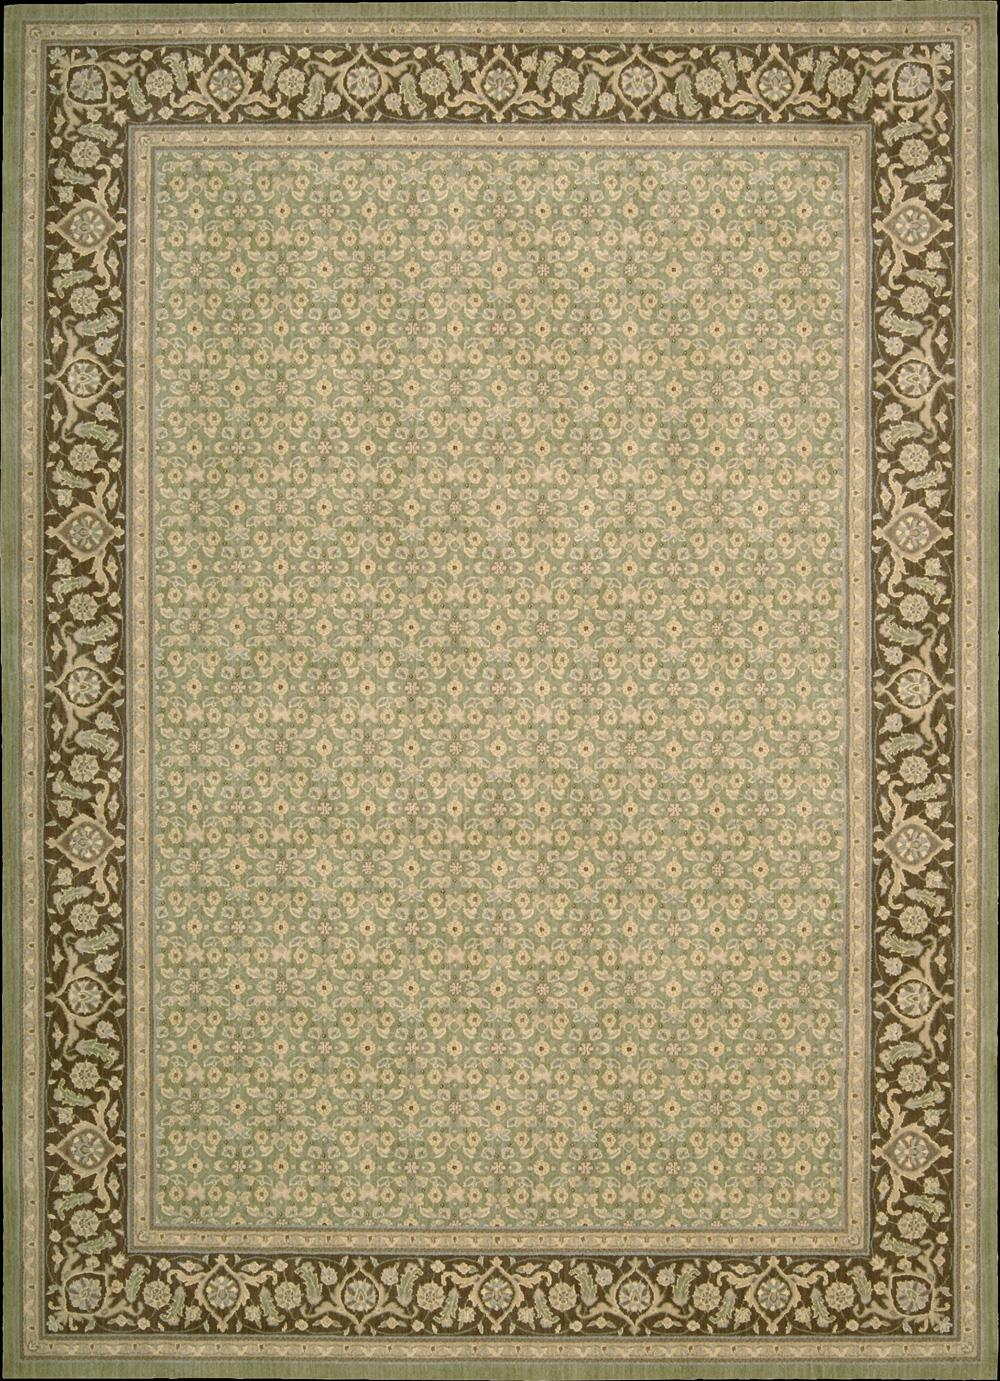 "Nourison Persian Empire Area Rug 9'6"" x 13' - Item Number: 44337"